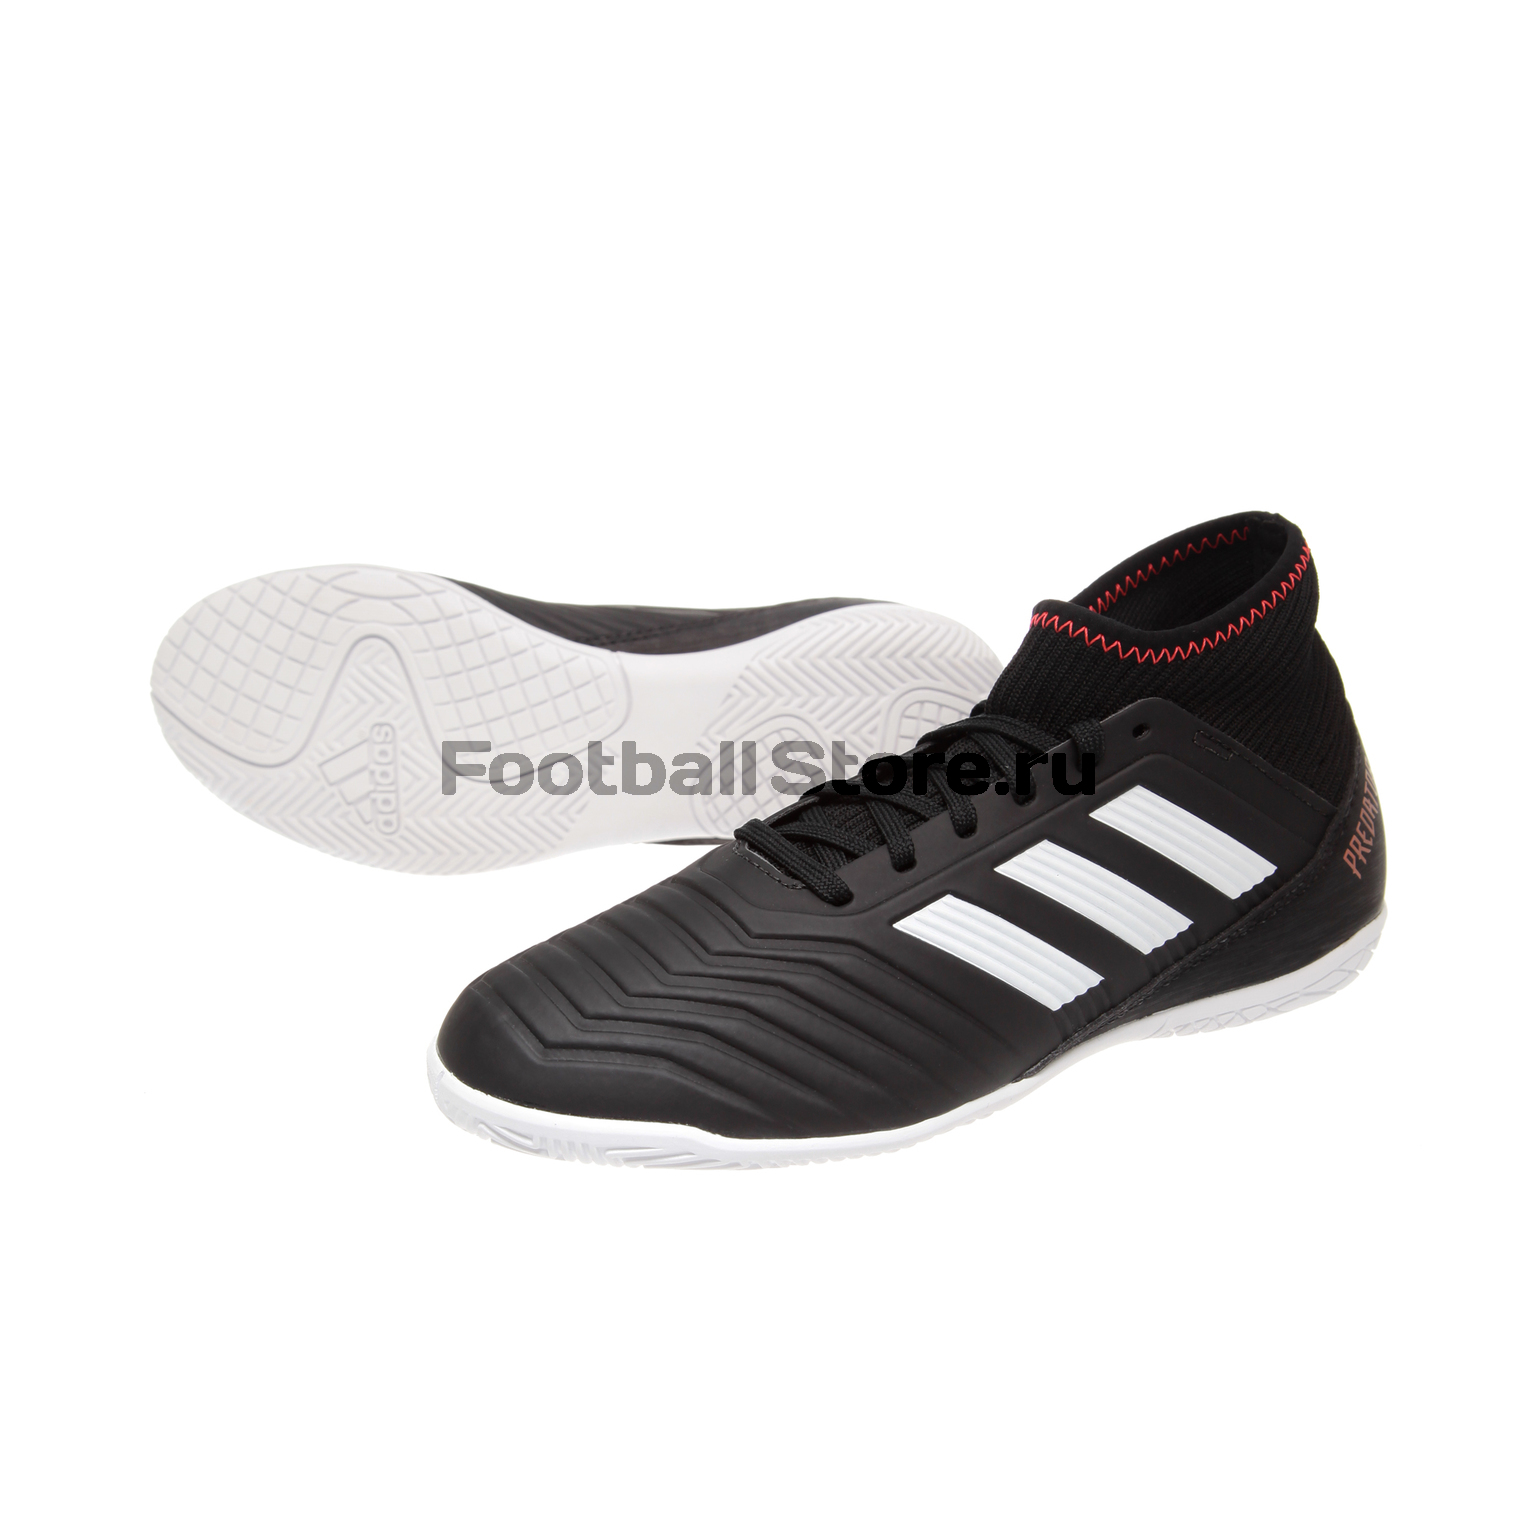 Обувь для зала Adidas Predator Tango 18.3 IN JR CP9076 обувь для зала adidas nemeziz tango 17 3 in jr cp9182